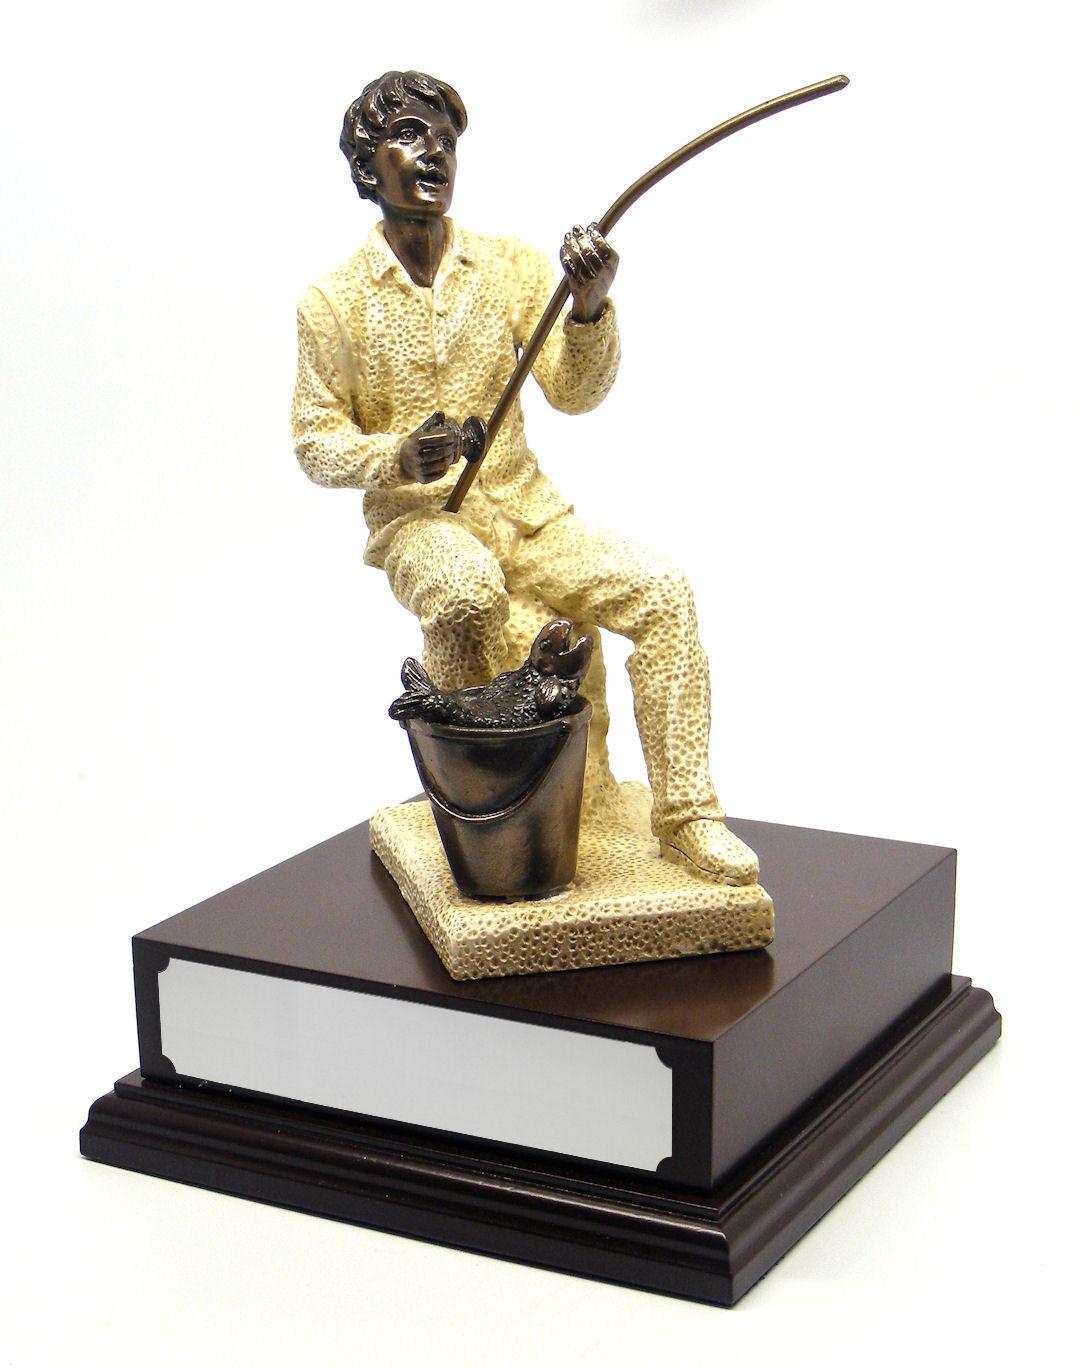 Personalised Fisherman Fishing Figurine Award Trophy On Engraved Wooden Base